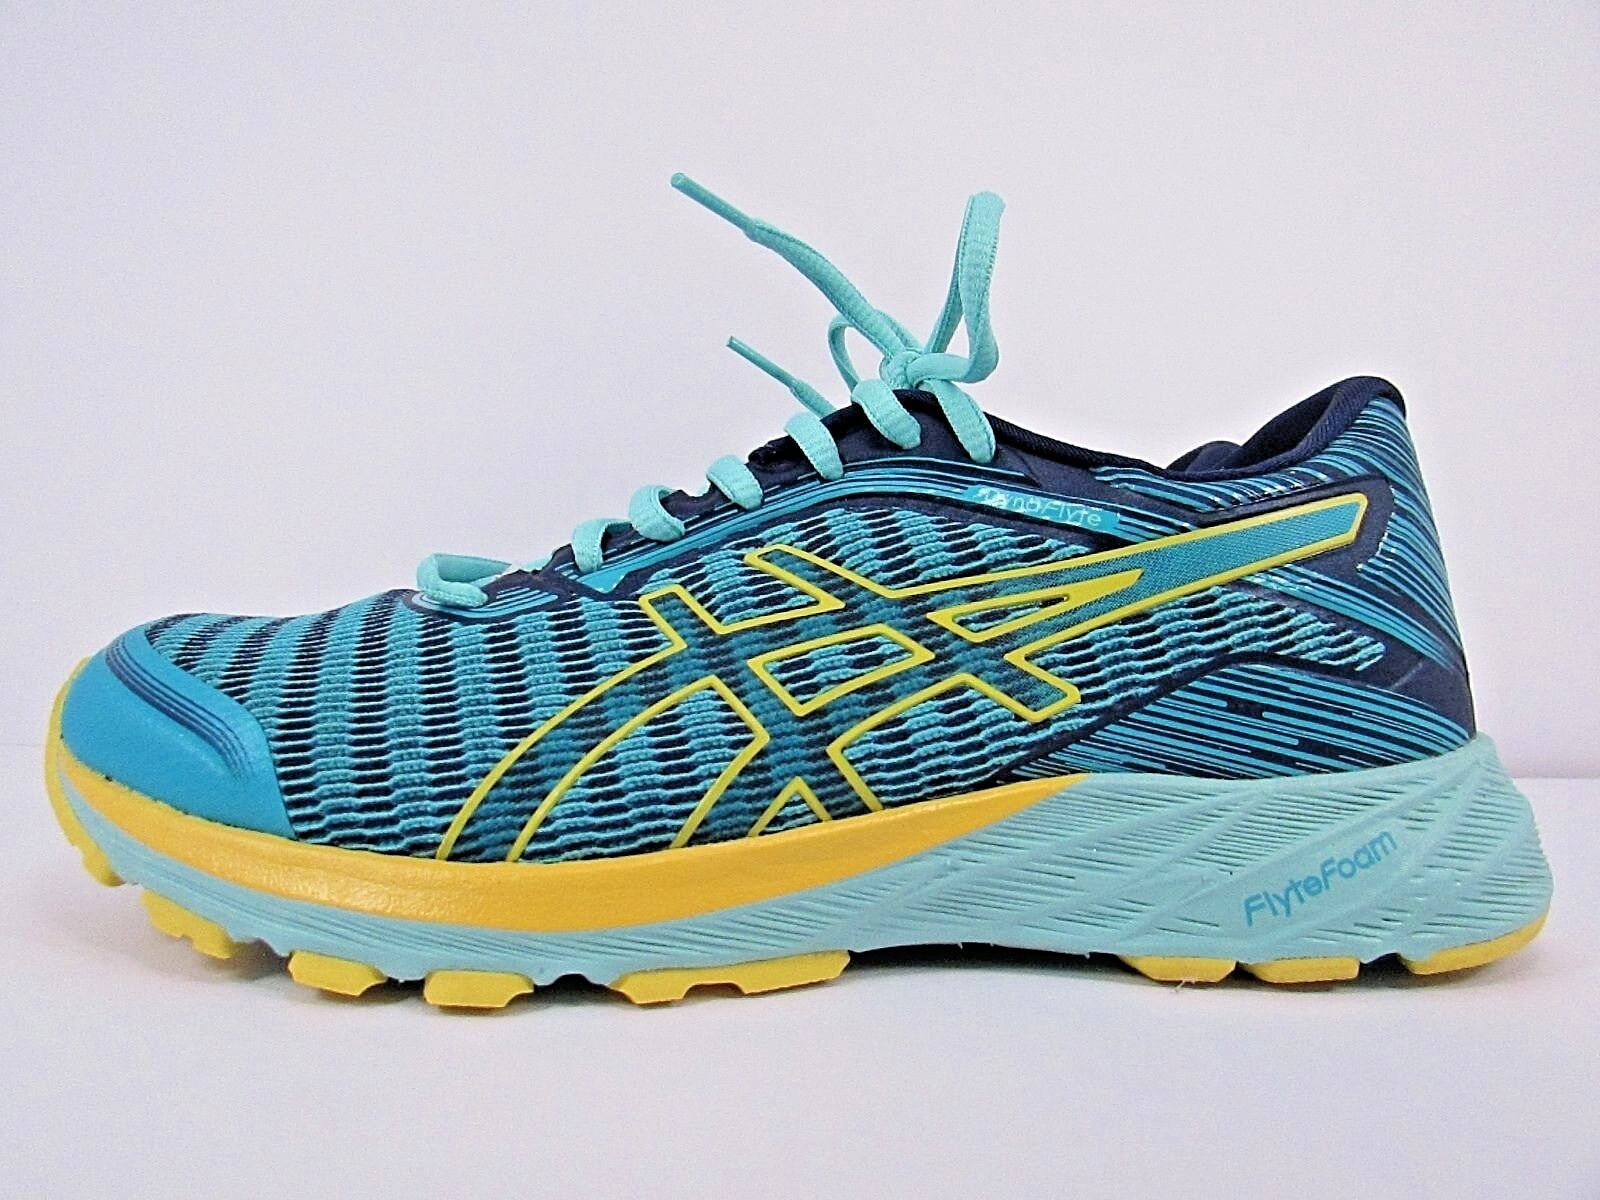 WOMEN'S ASICS DYNAFLYTE Größe 7   RUNNING Schuhe  WORN LESS THAN 10 MILES